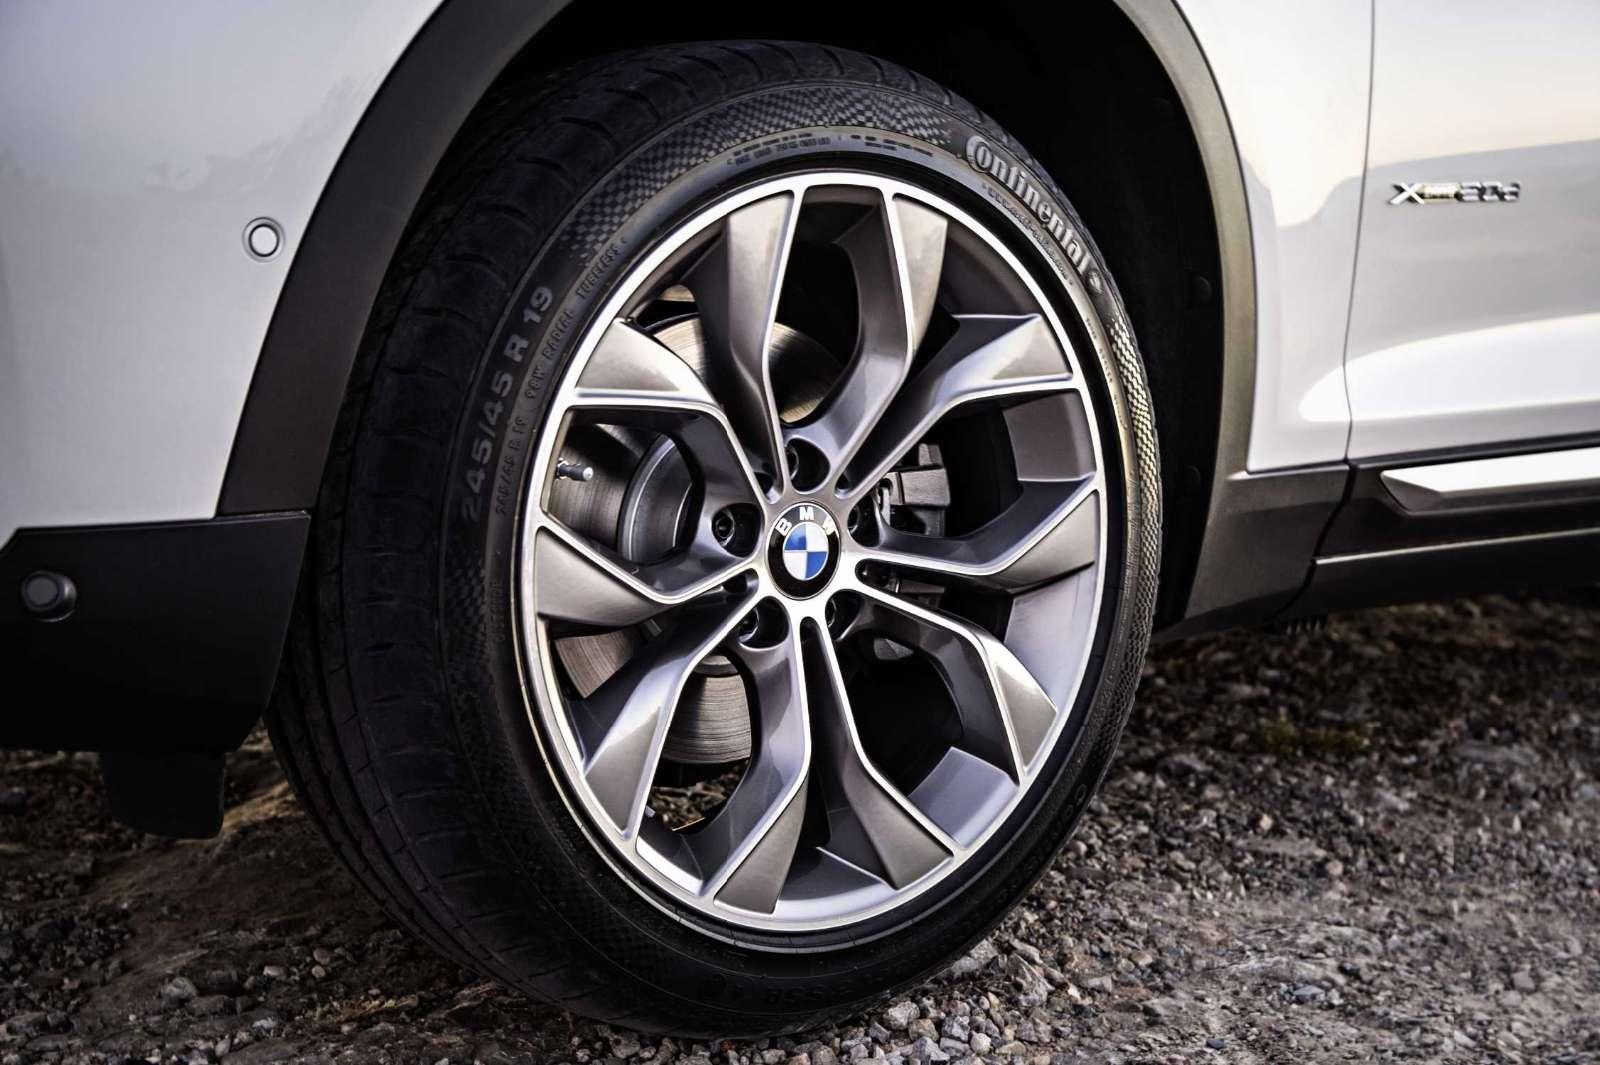 BMW X3 2015 Facelift wheels